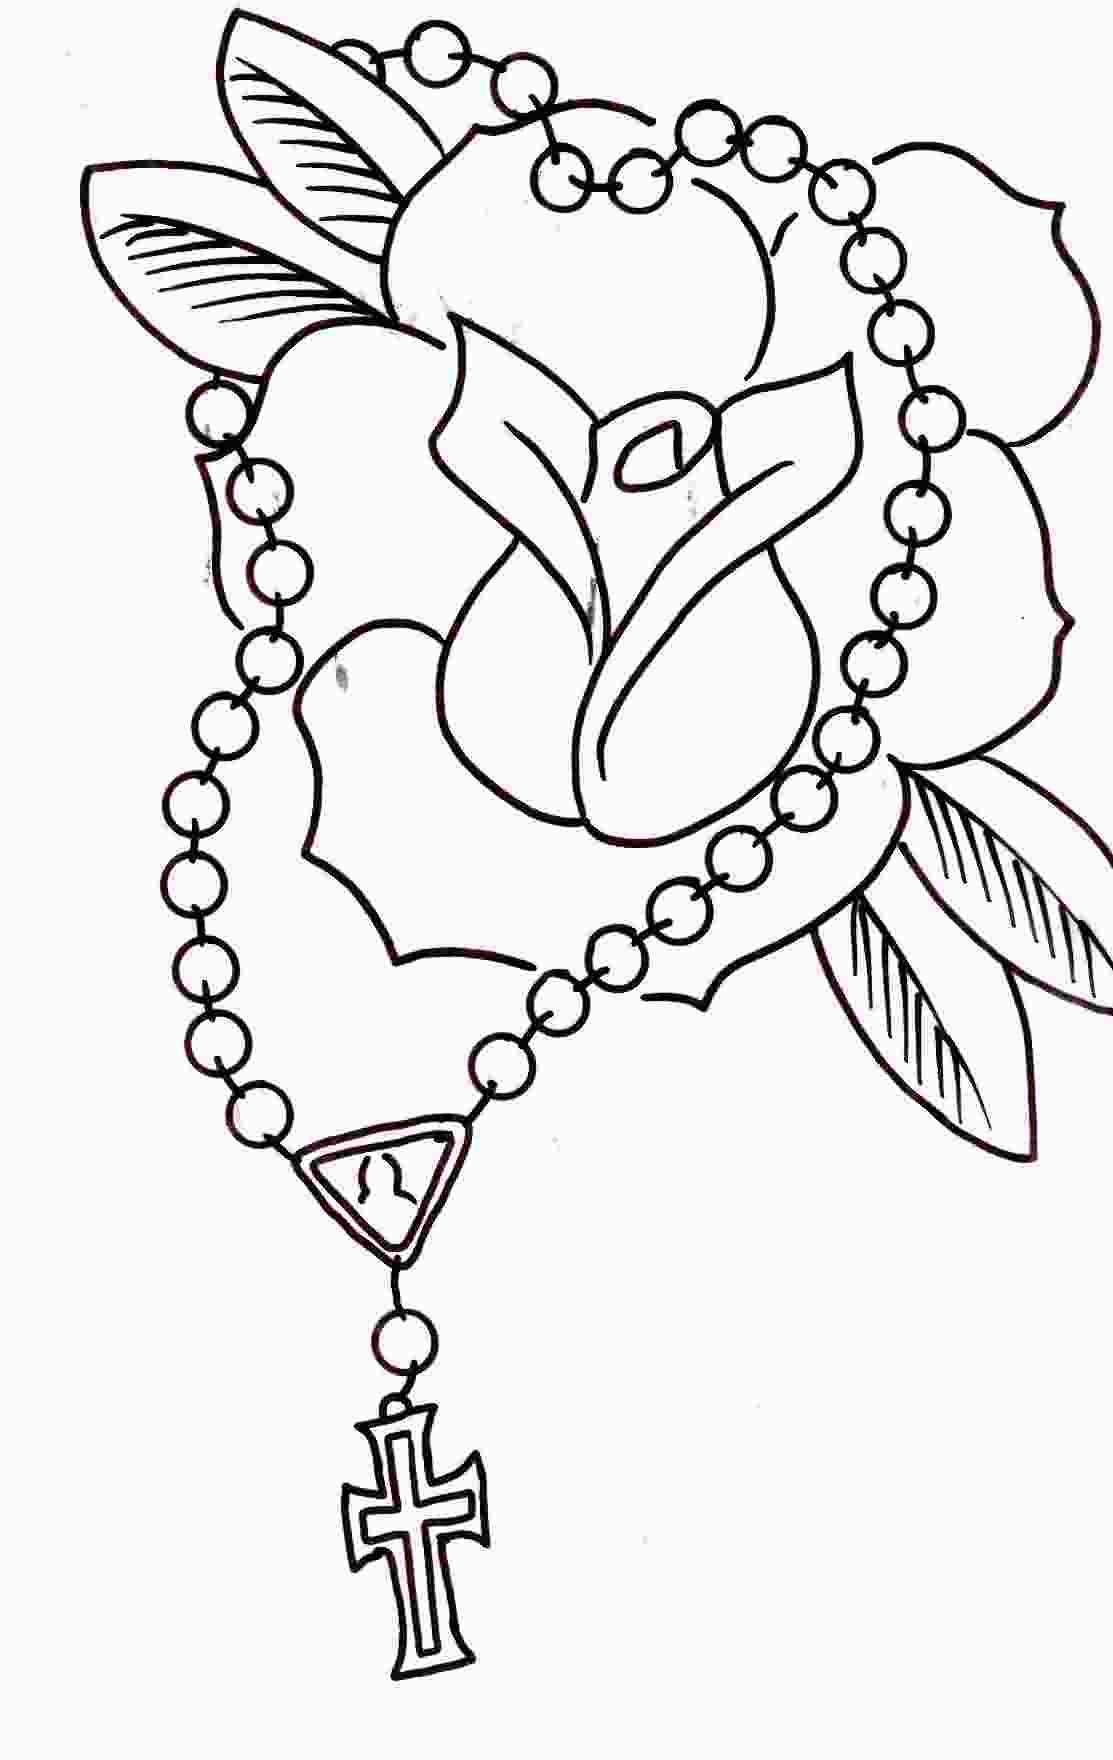 Rosary Cross Drawing at GetDrawings | Free download